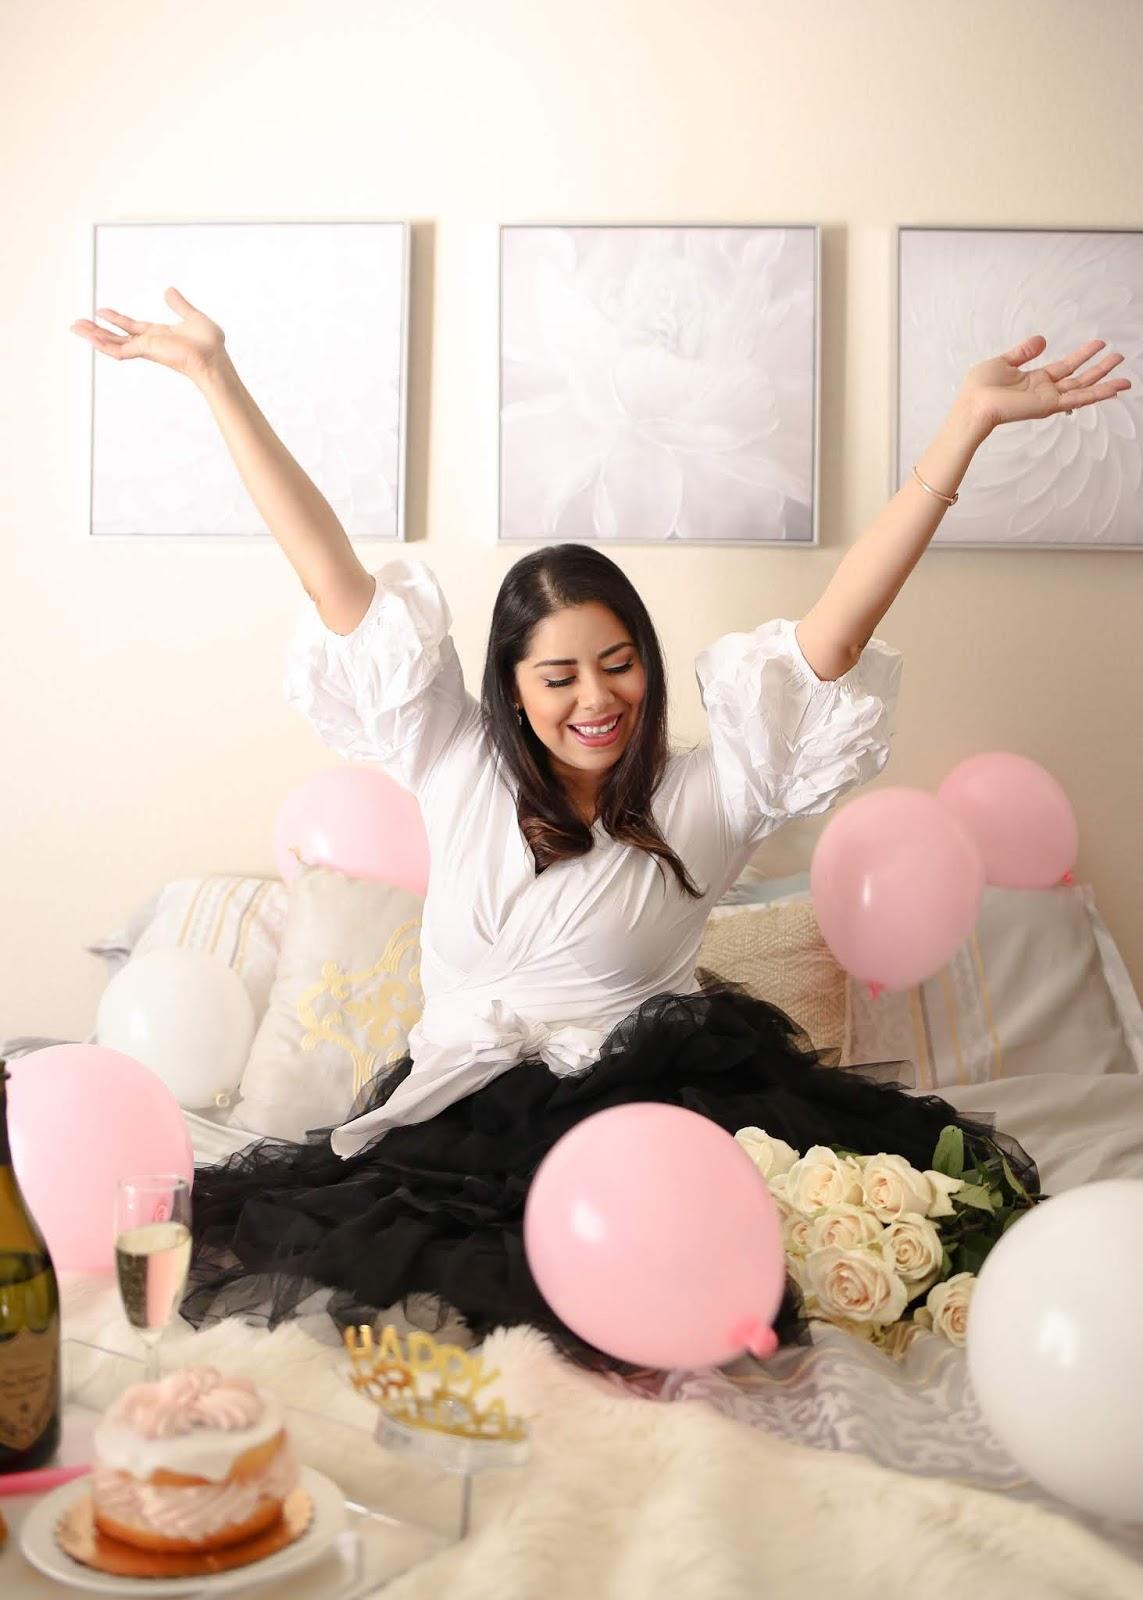 fashion blogger celebrating birthday, san diego fashion blogger birthday